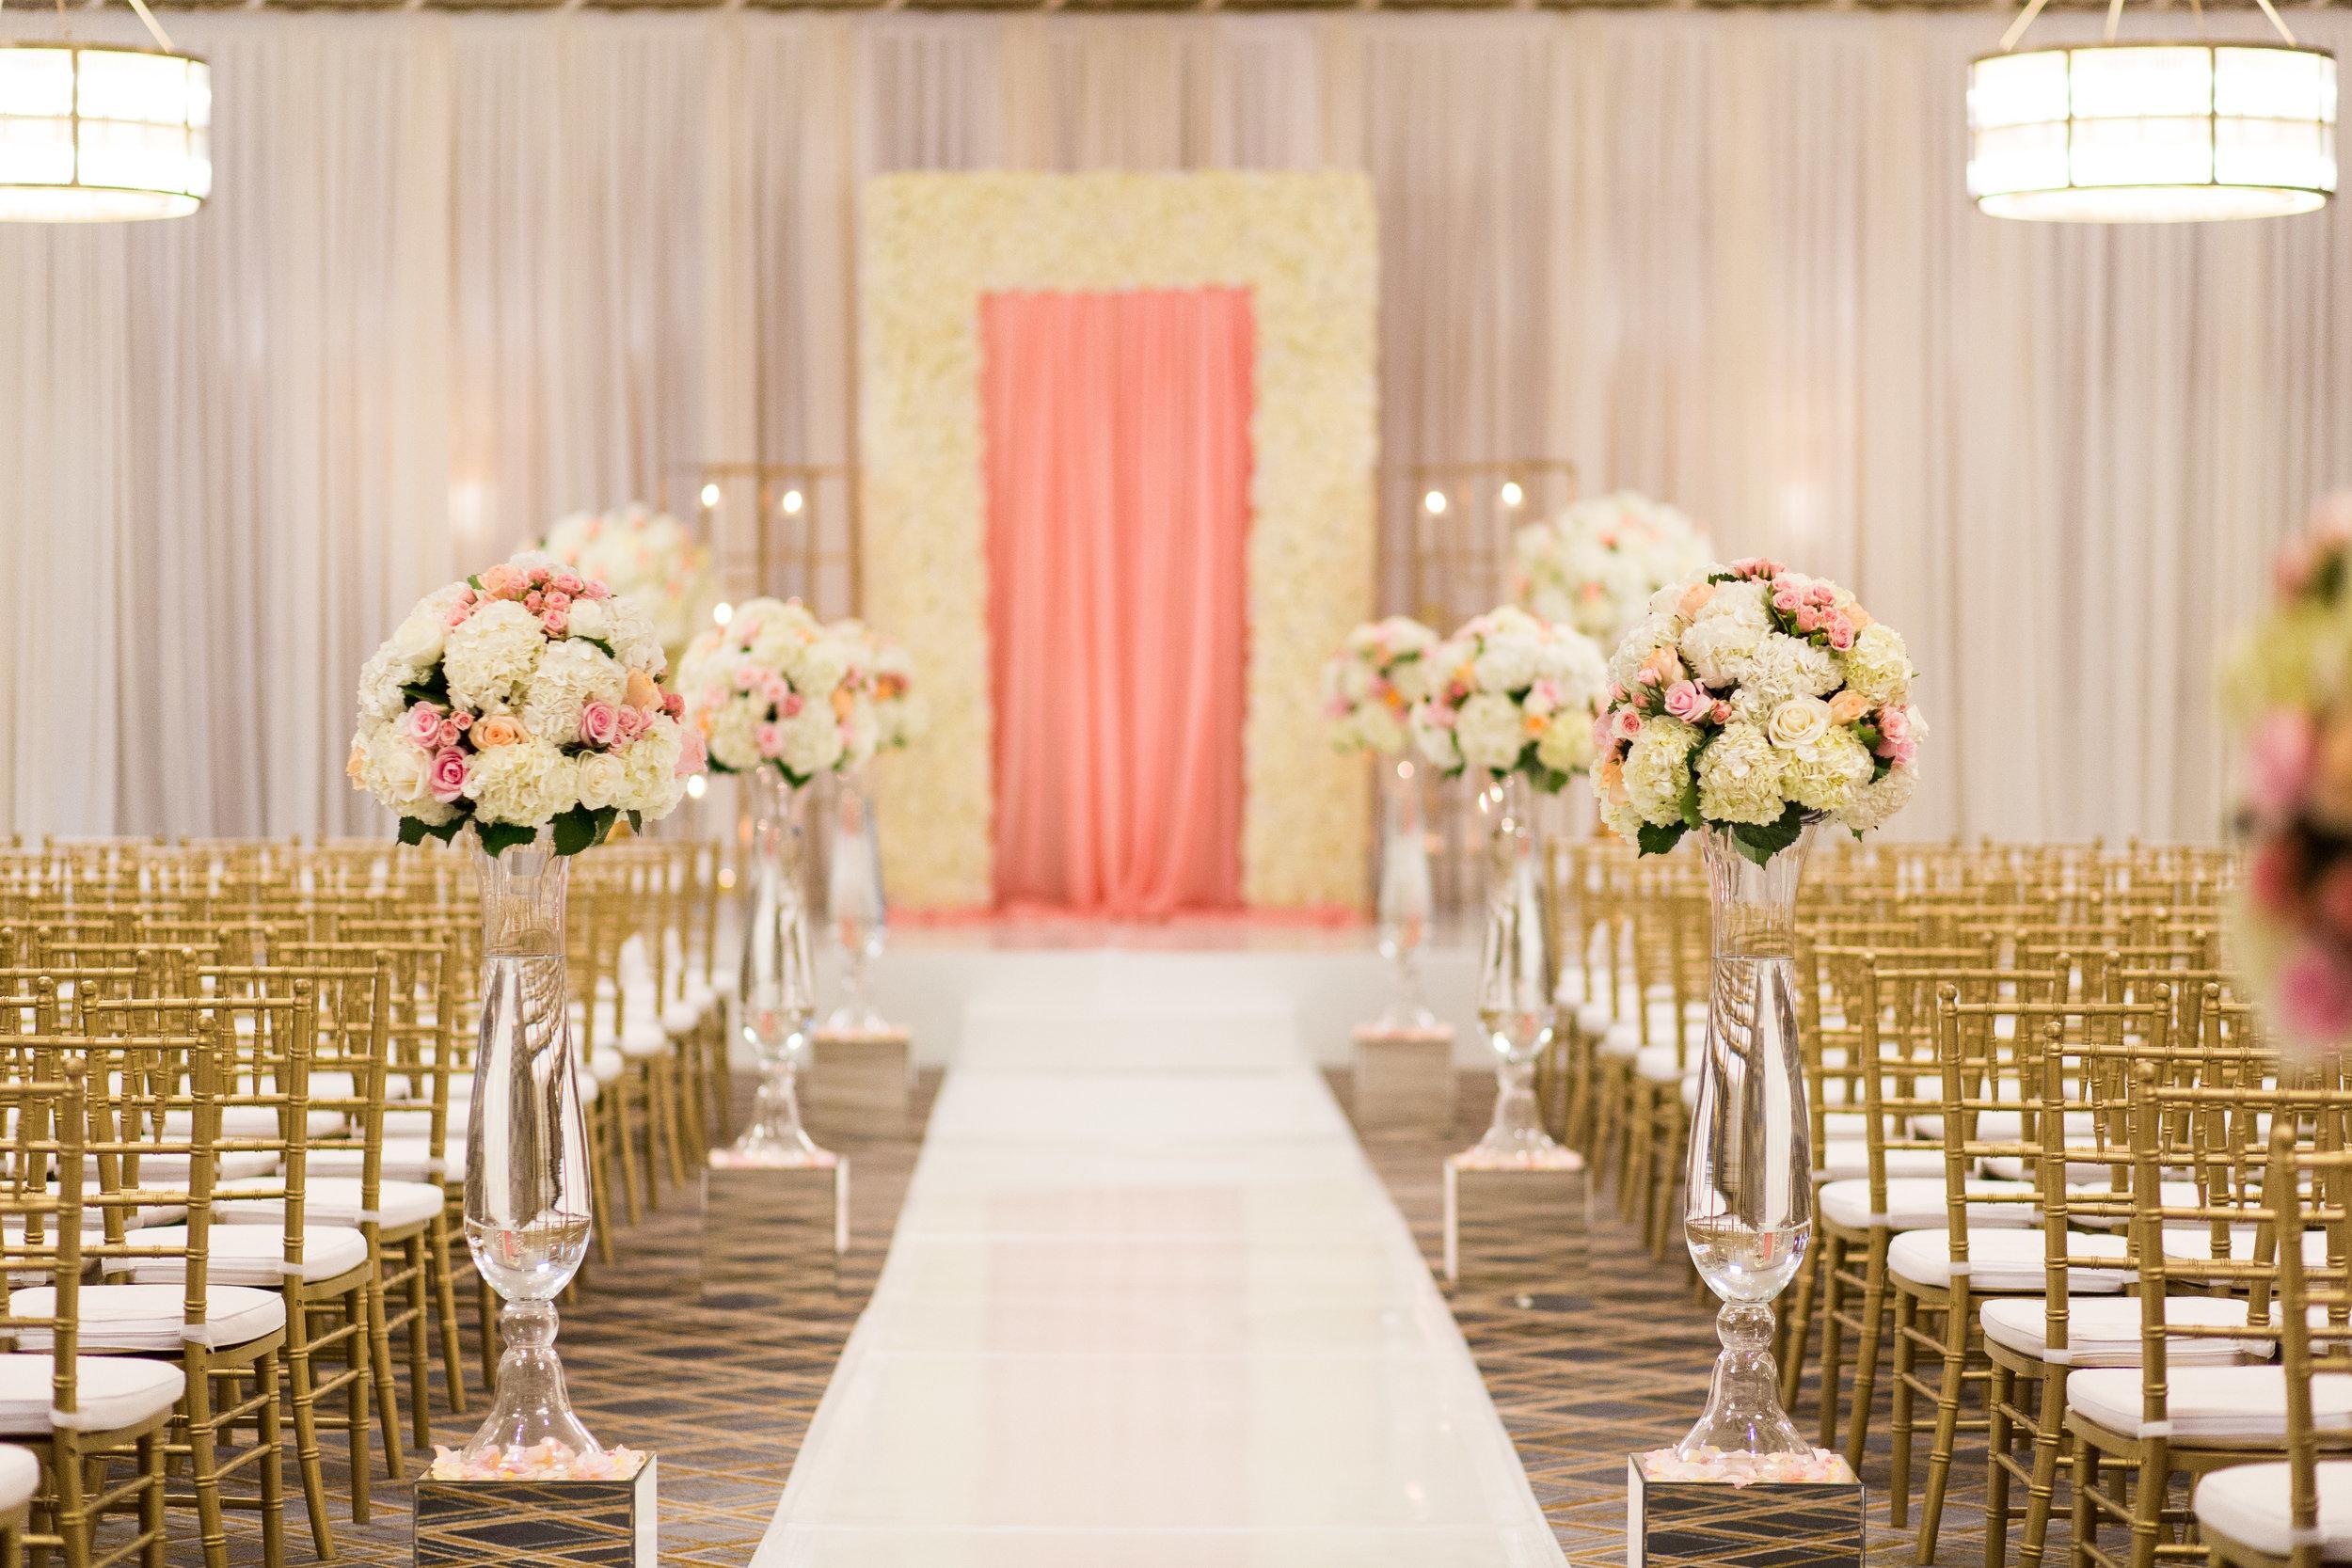 SJ_Wedding_Ceremony -2 - Copy.jpg